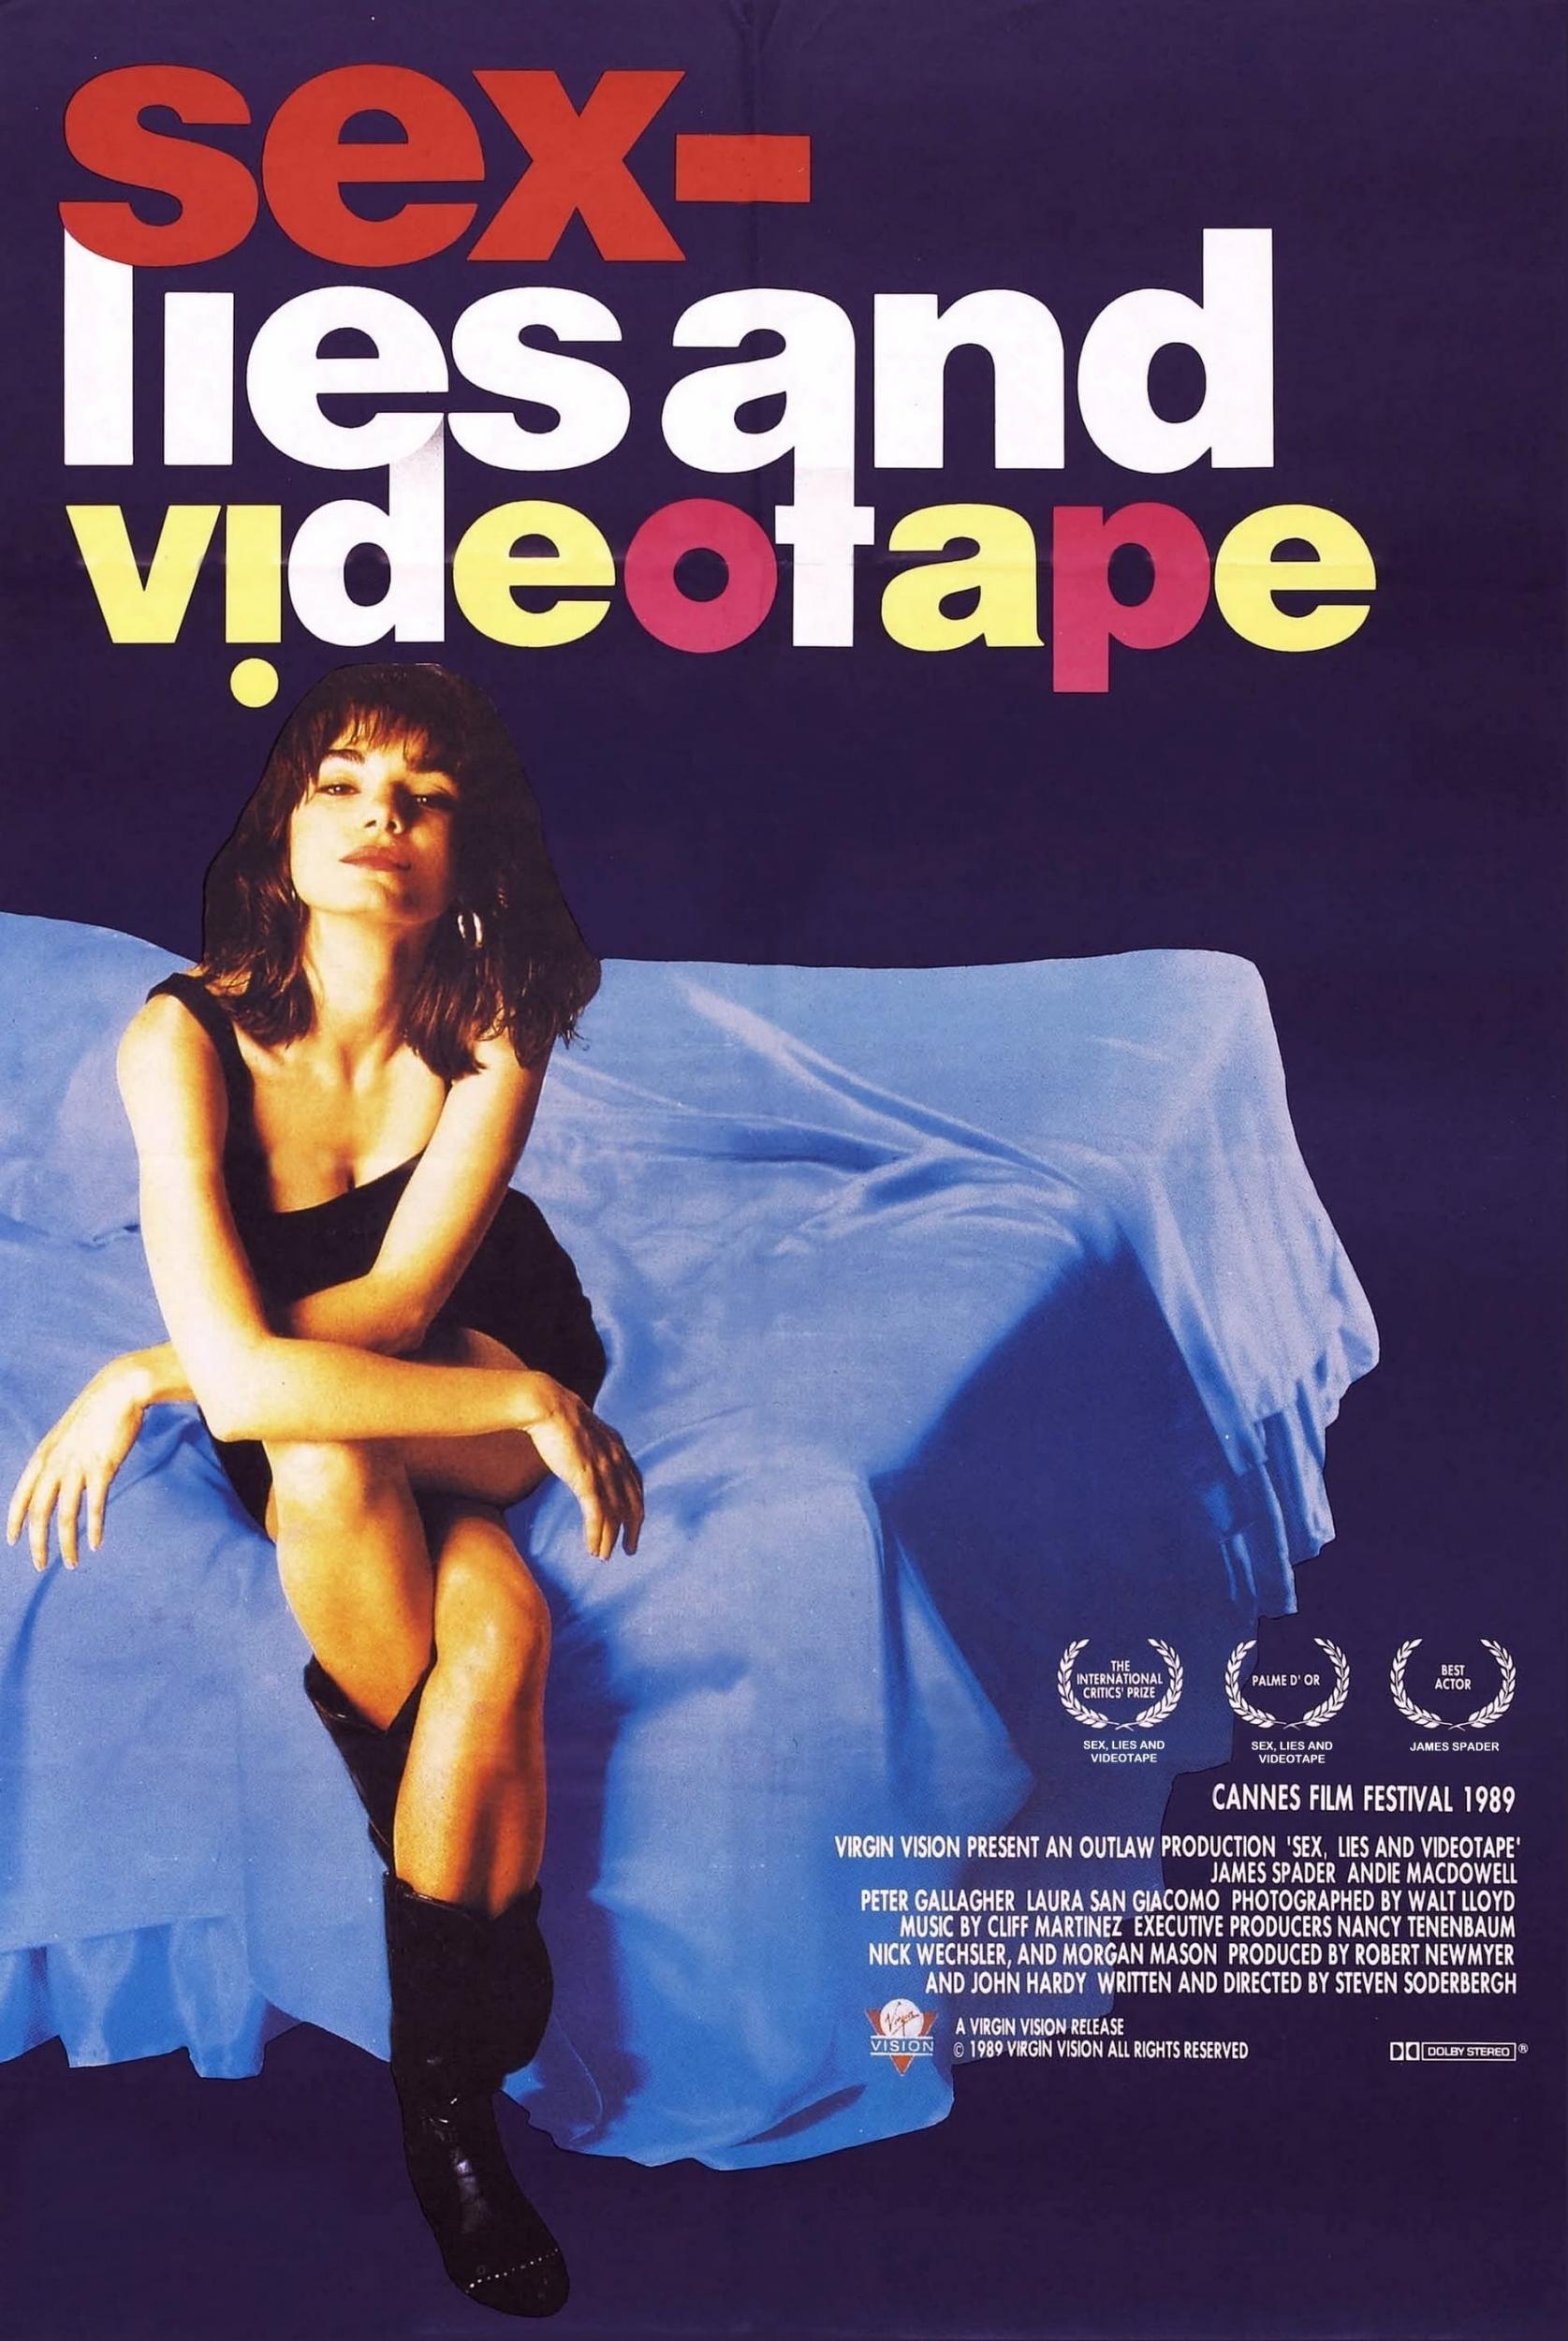 Andie Macdowell Sex Tape sex, lies, and videotape at 30: how steven soderbergh's